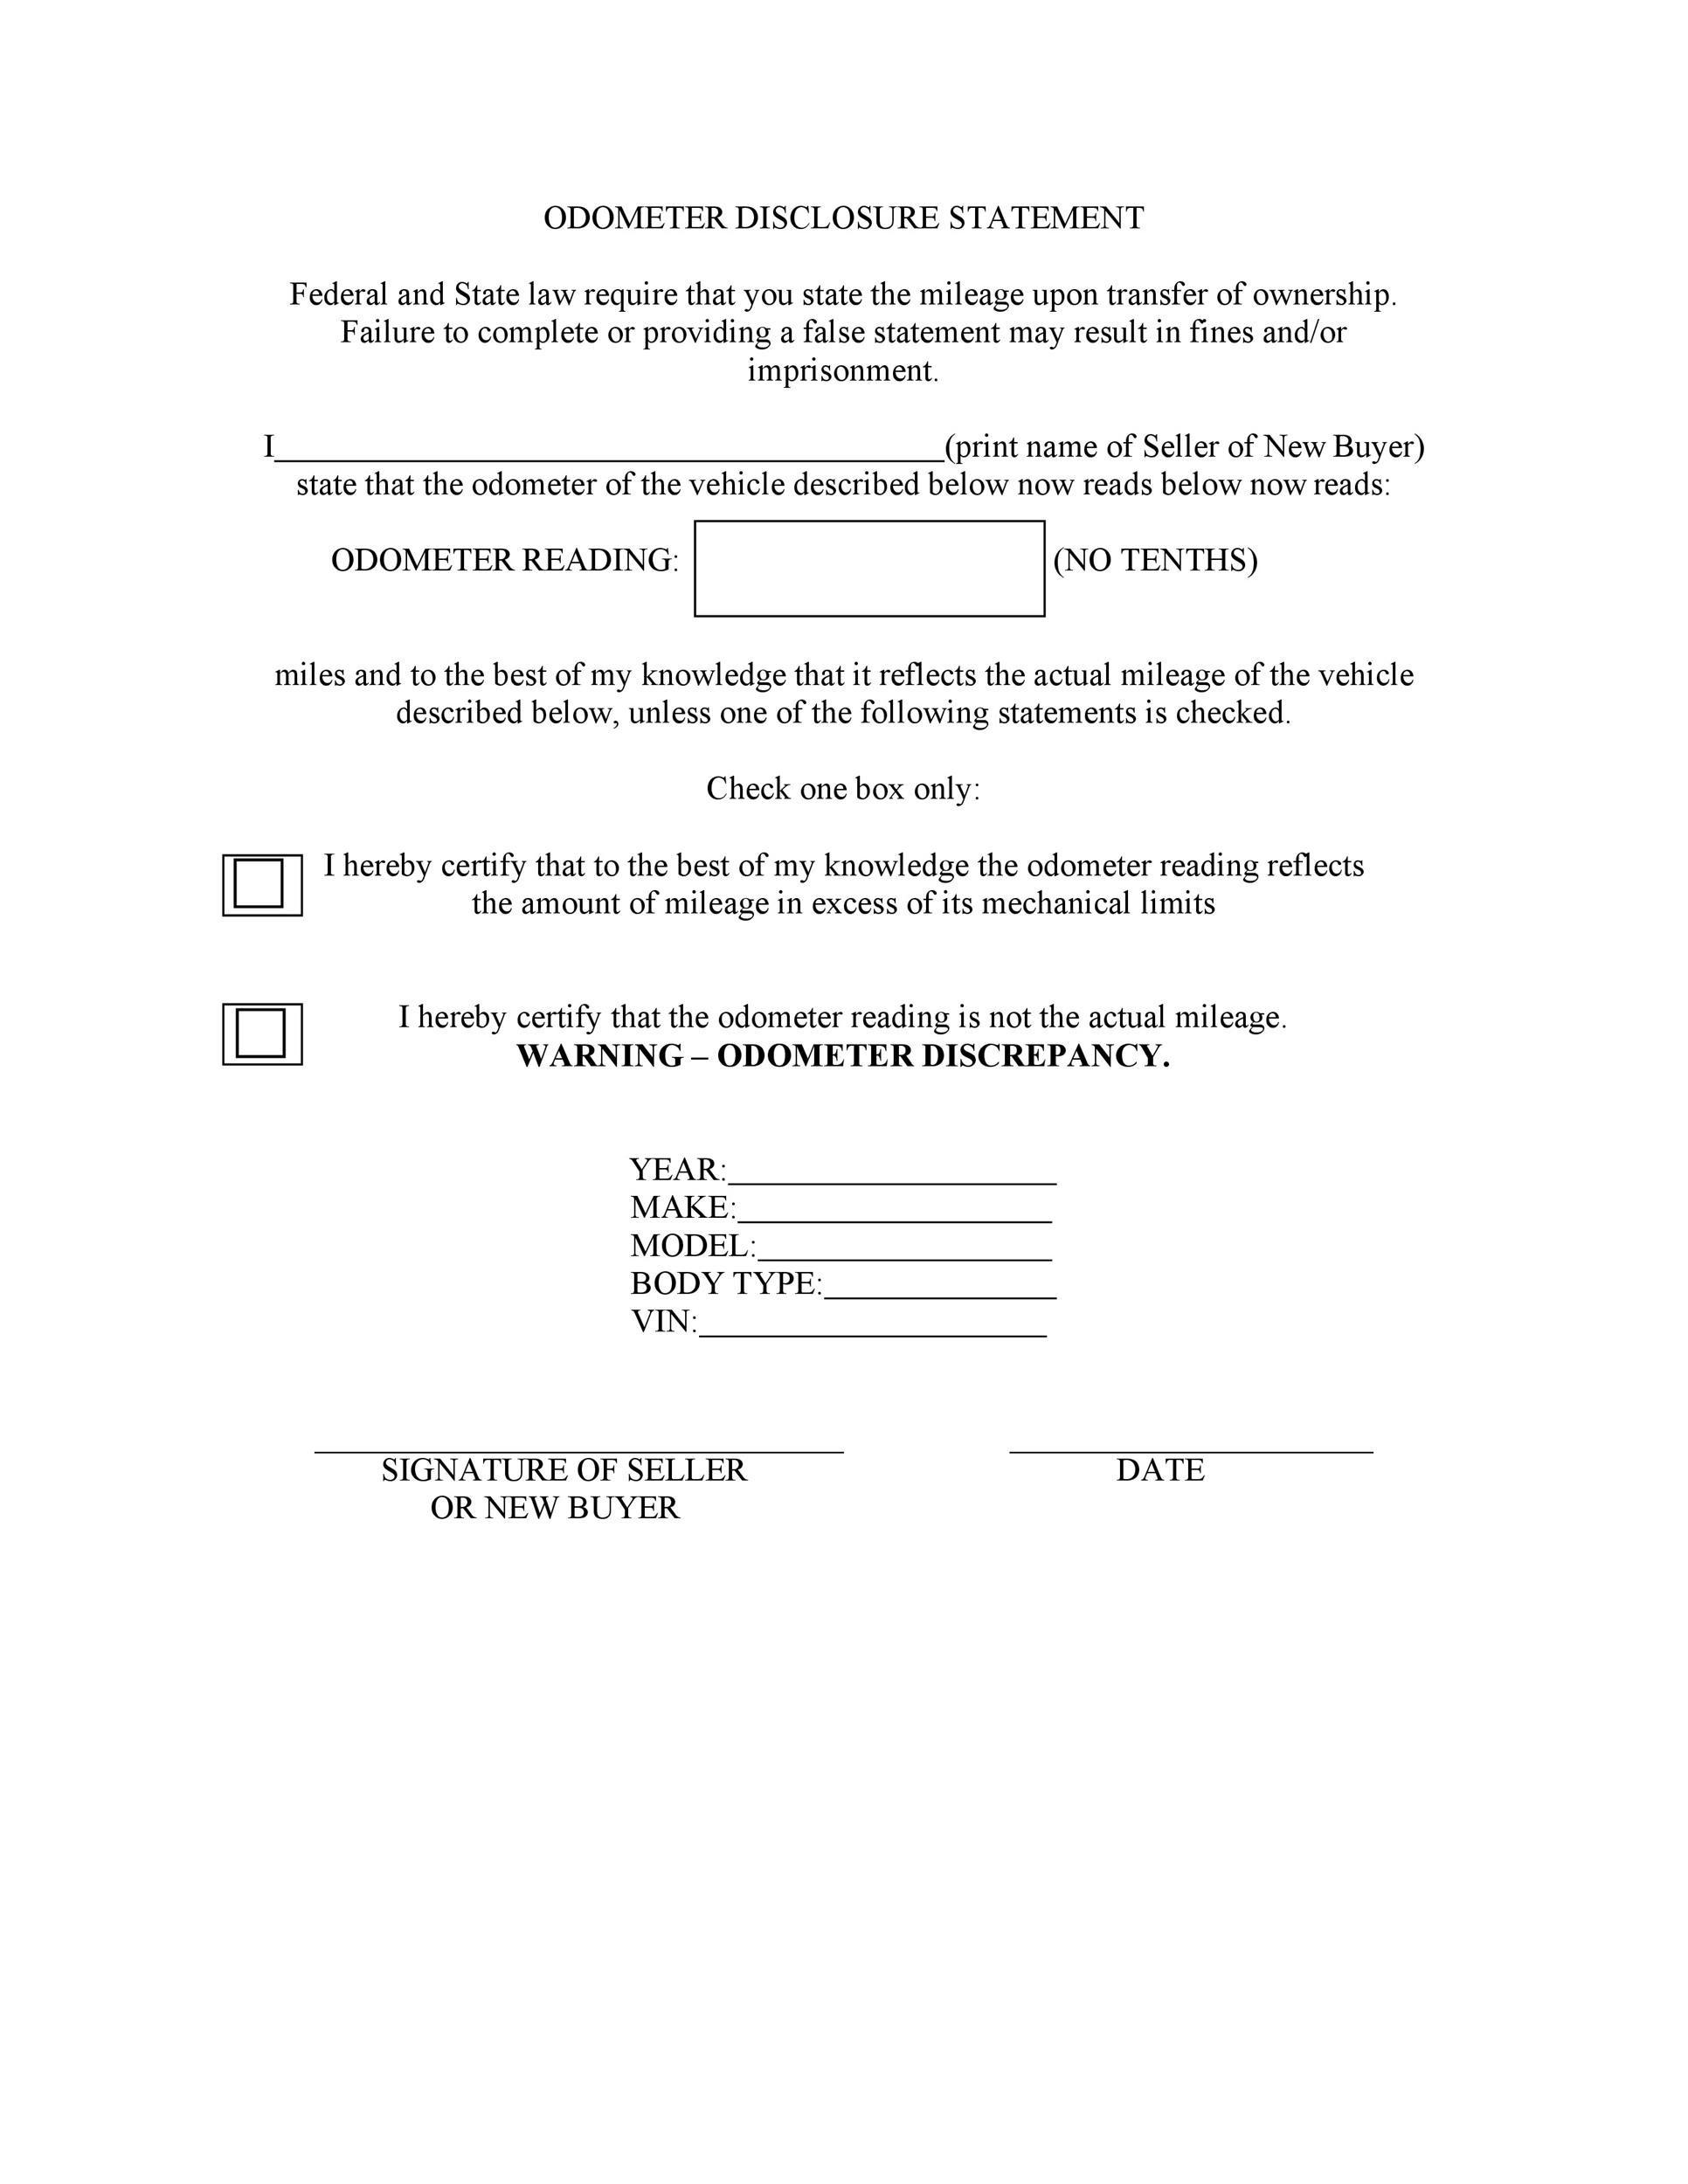 Free odometer disclosure statement 25